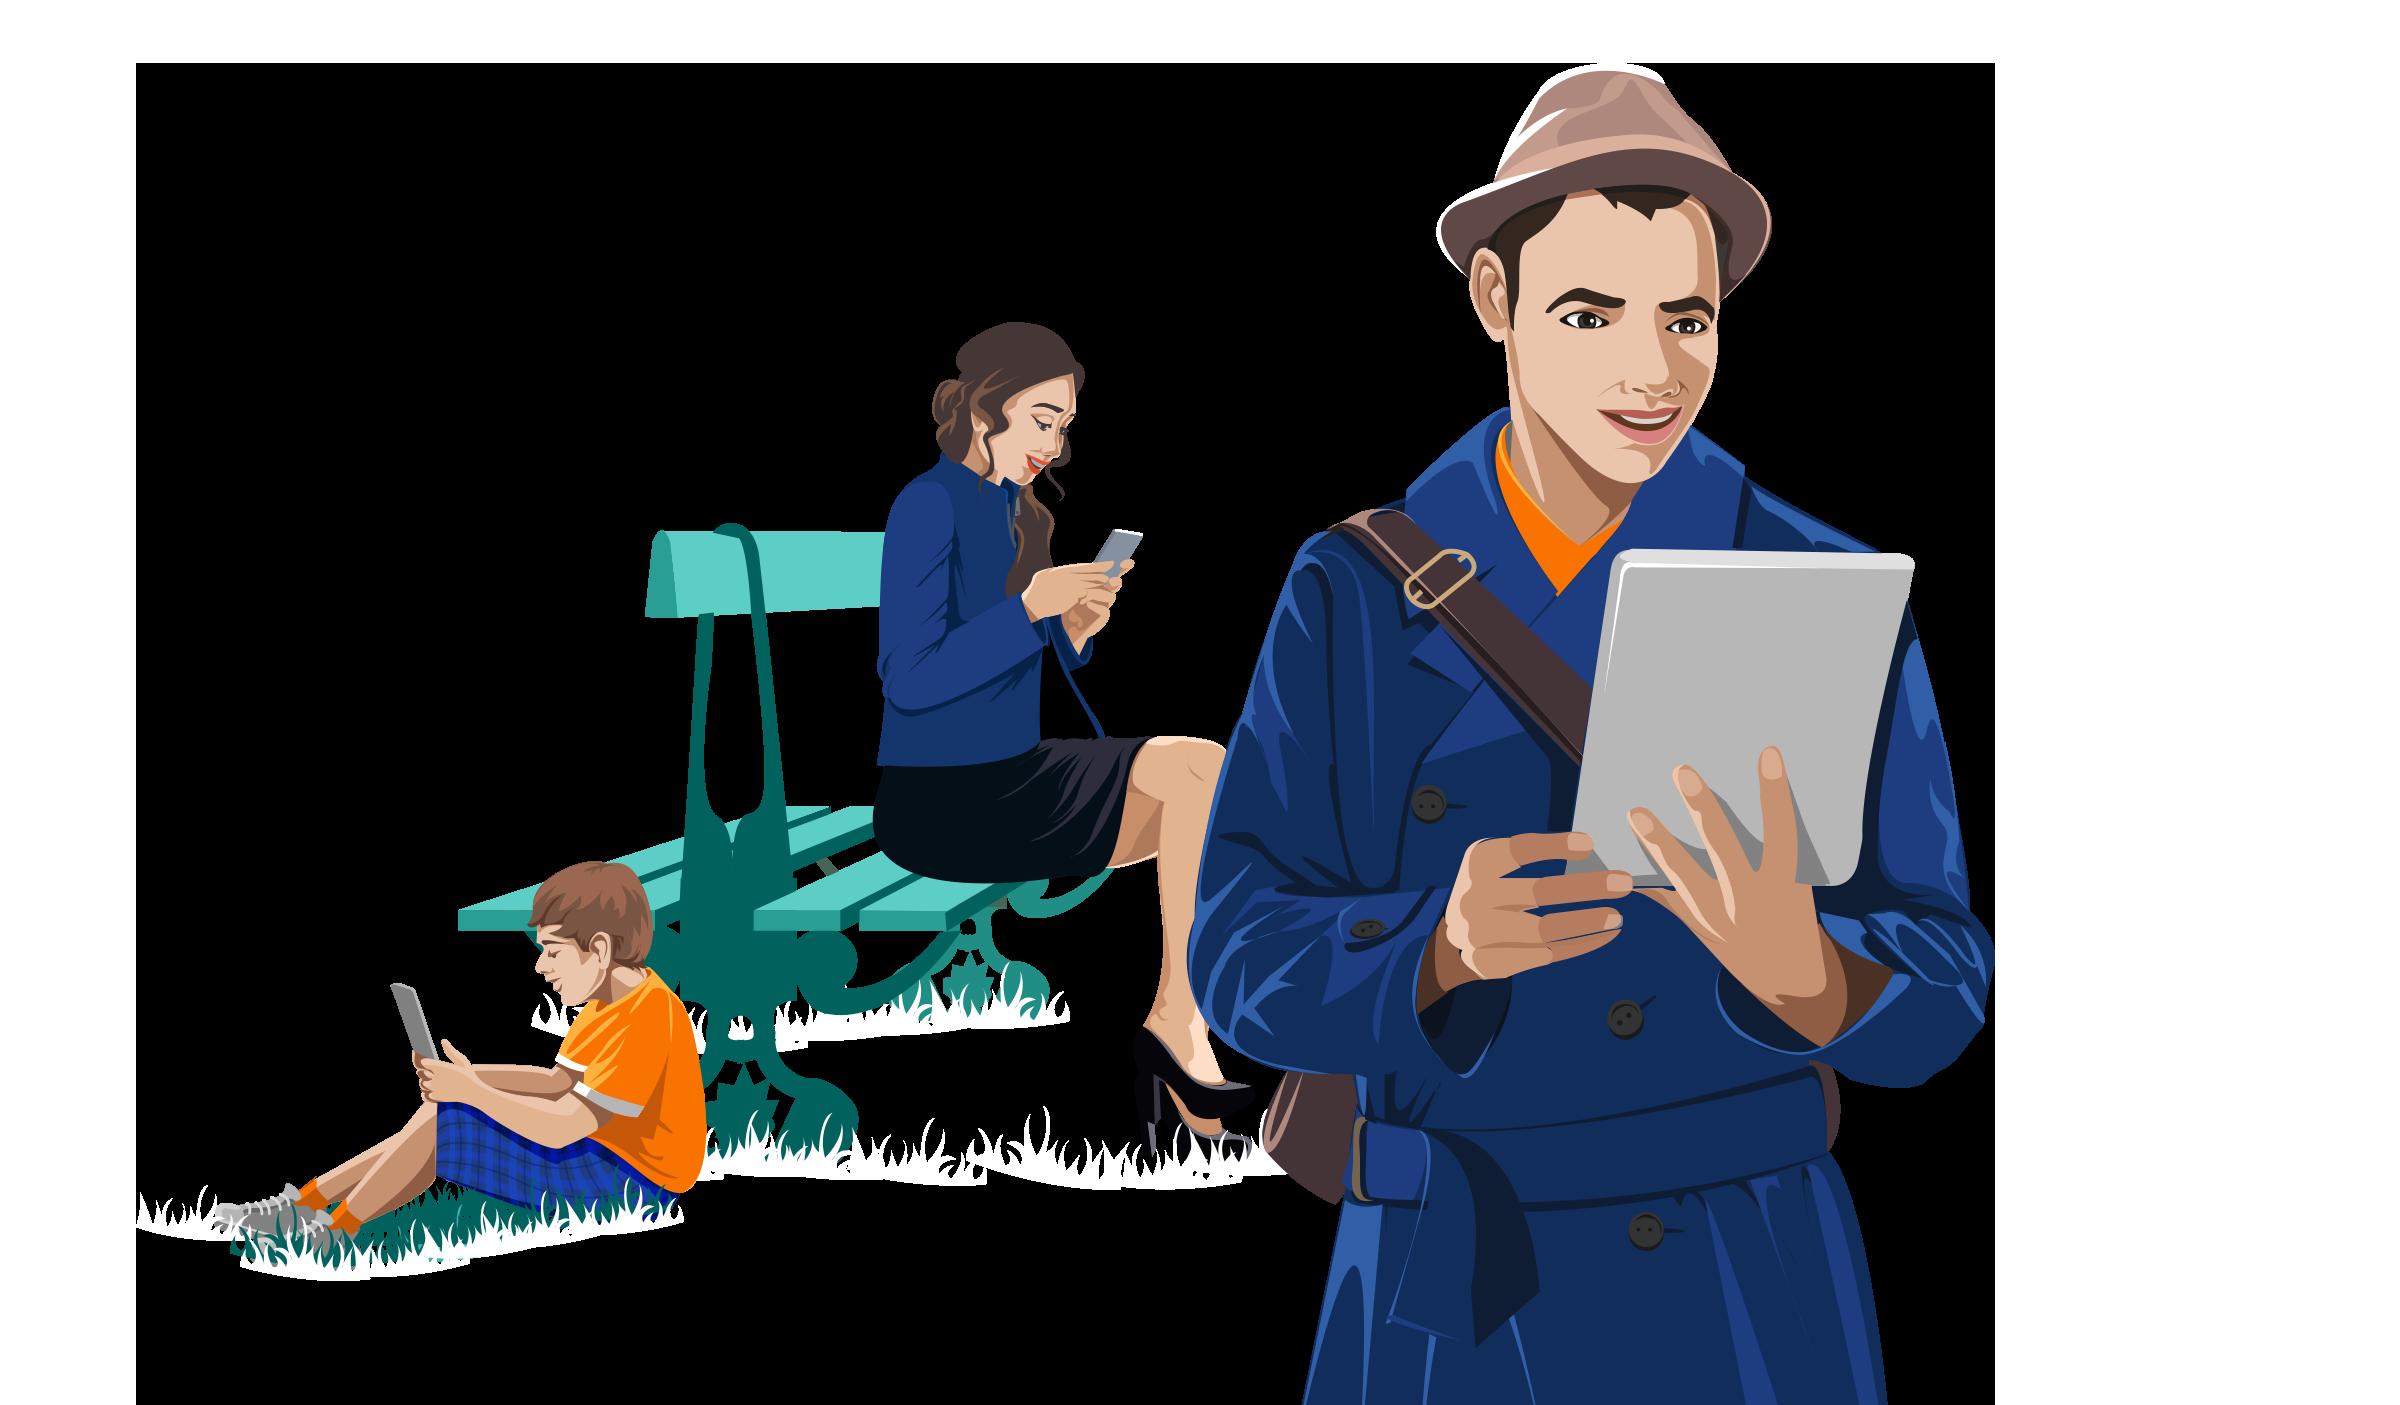 Readium : men with tablet